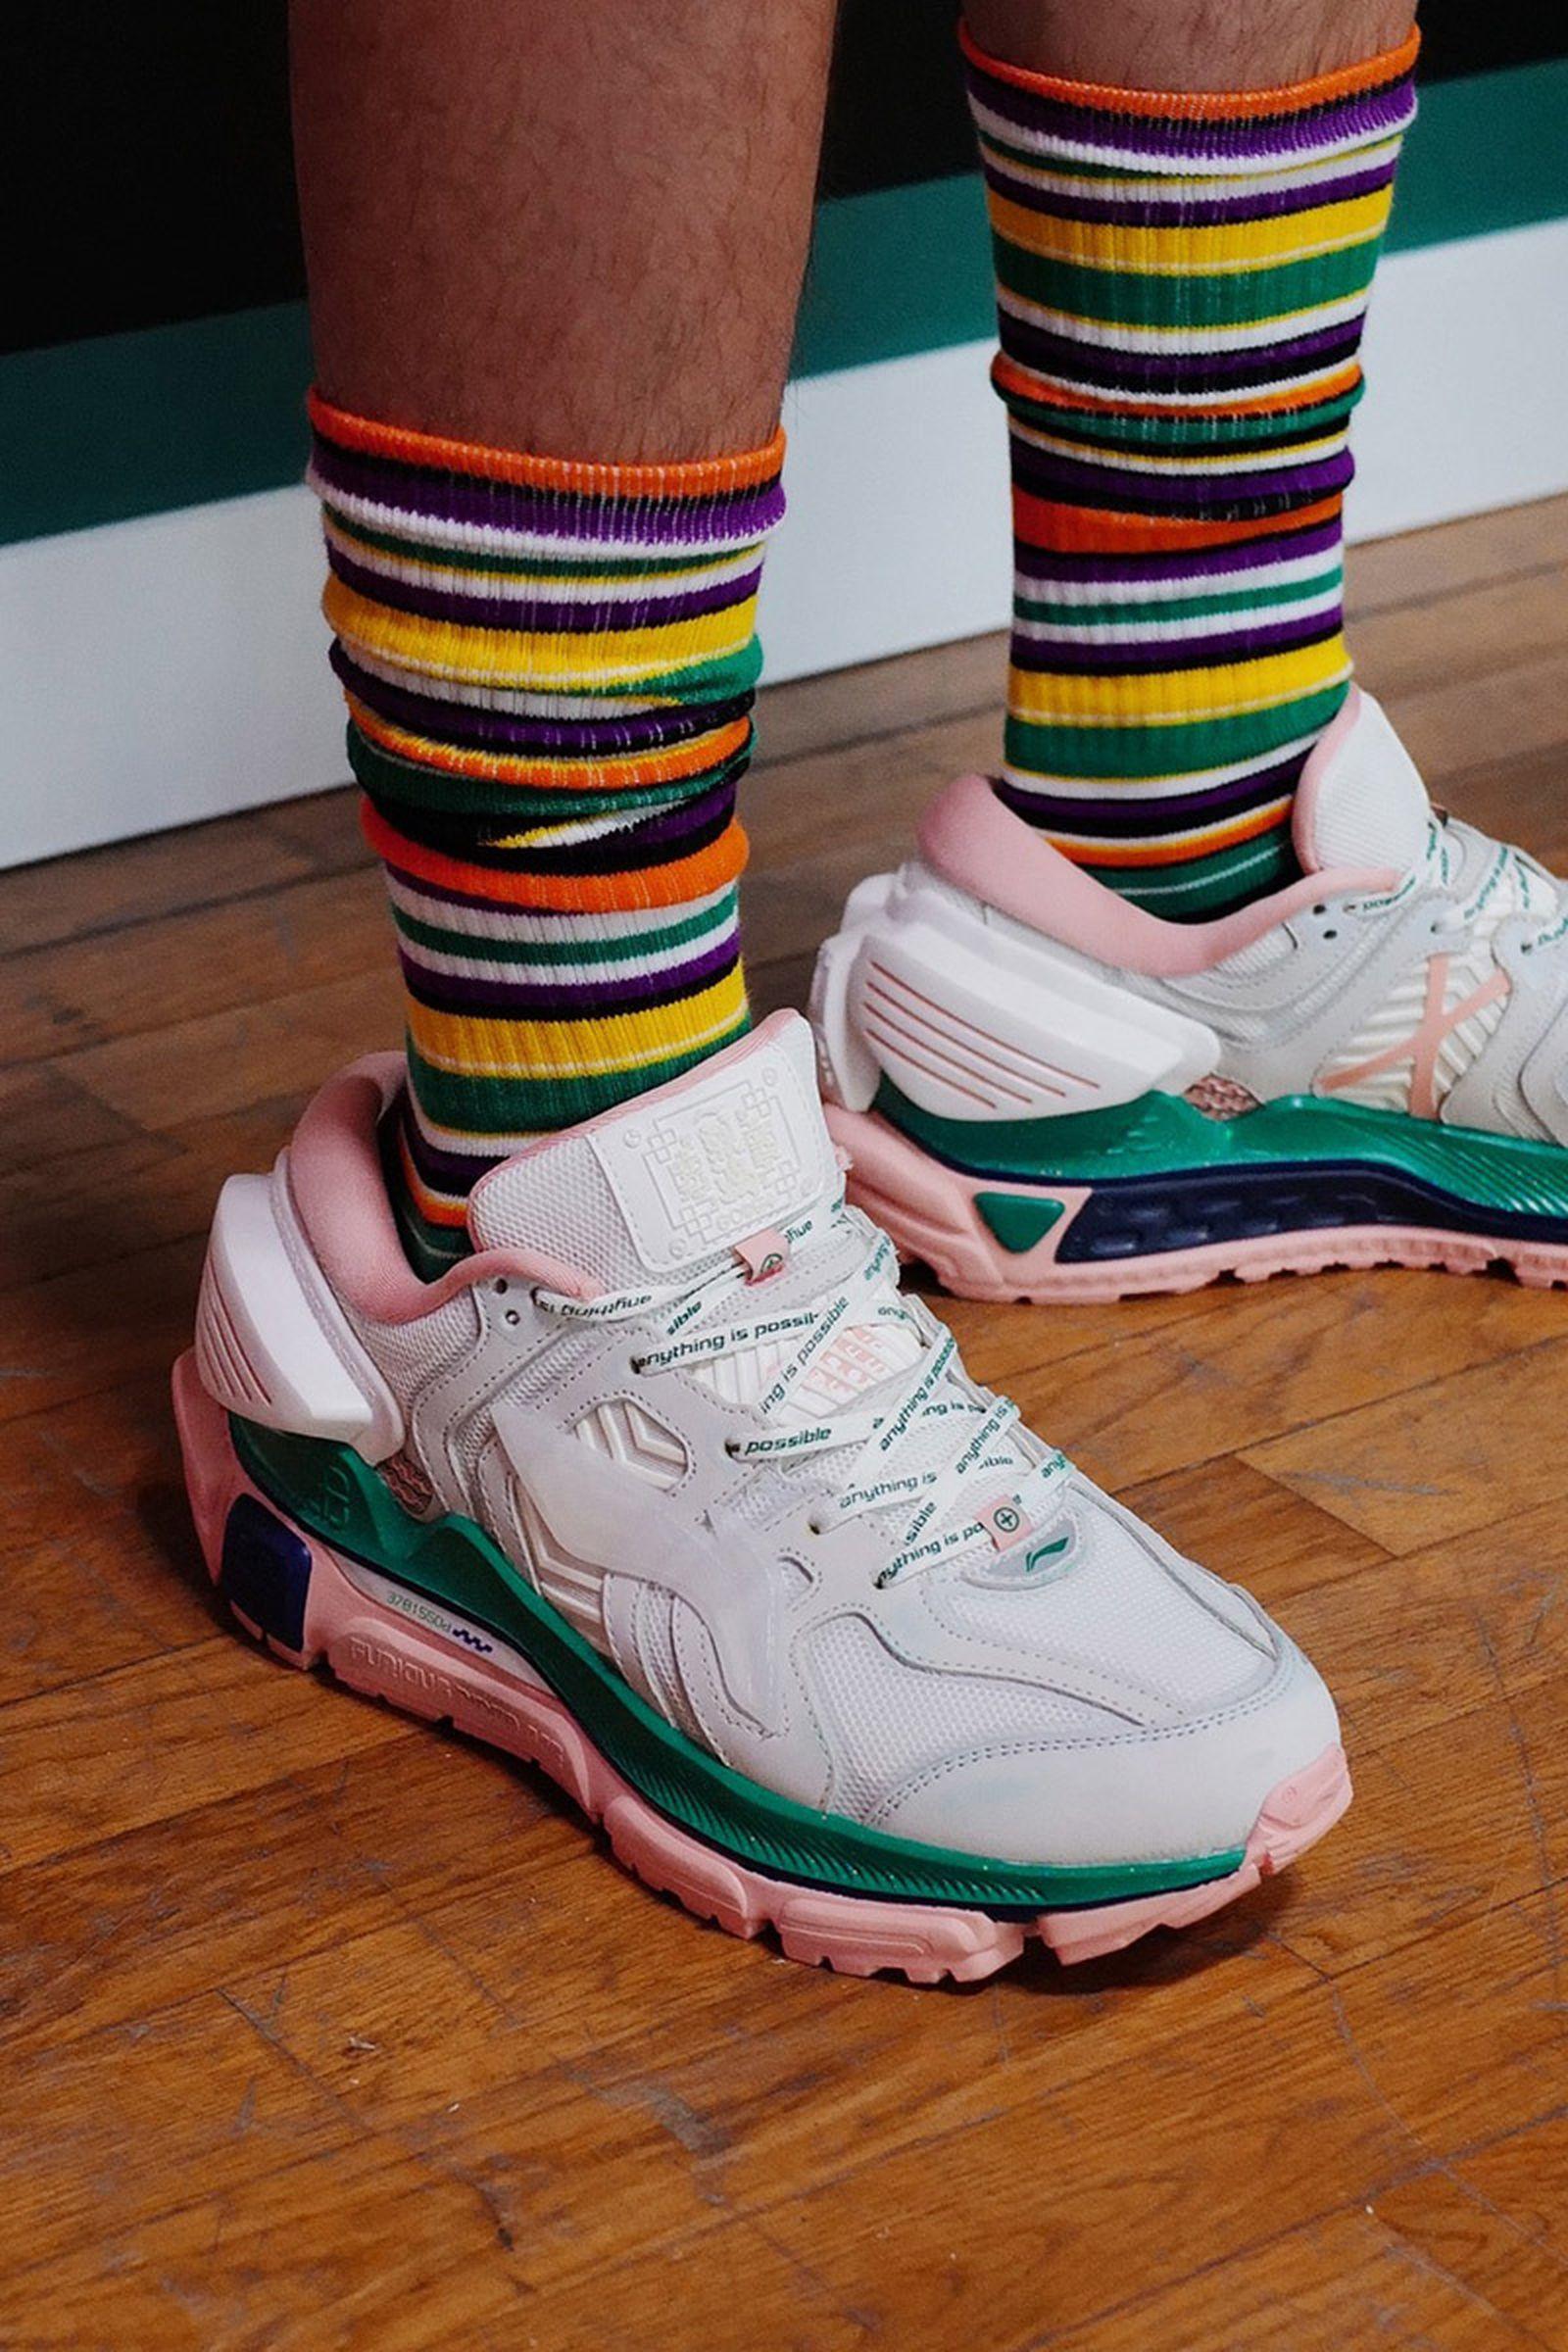 li ning ss20 sneakers IMG 1718 Louis Vuitton Nike OAMC